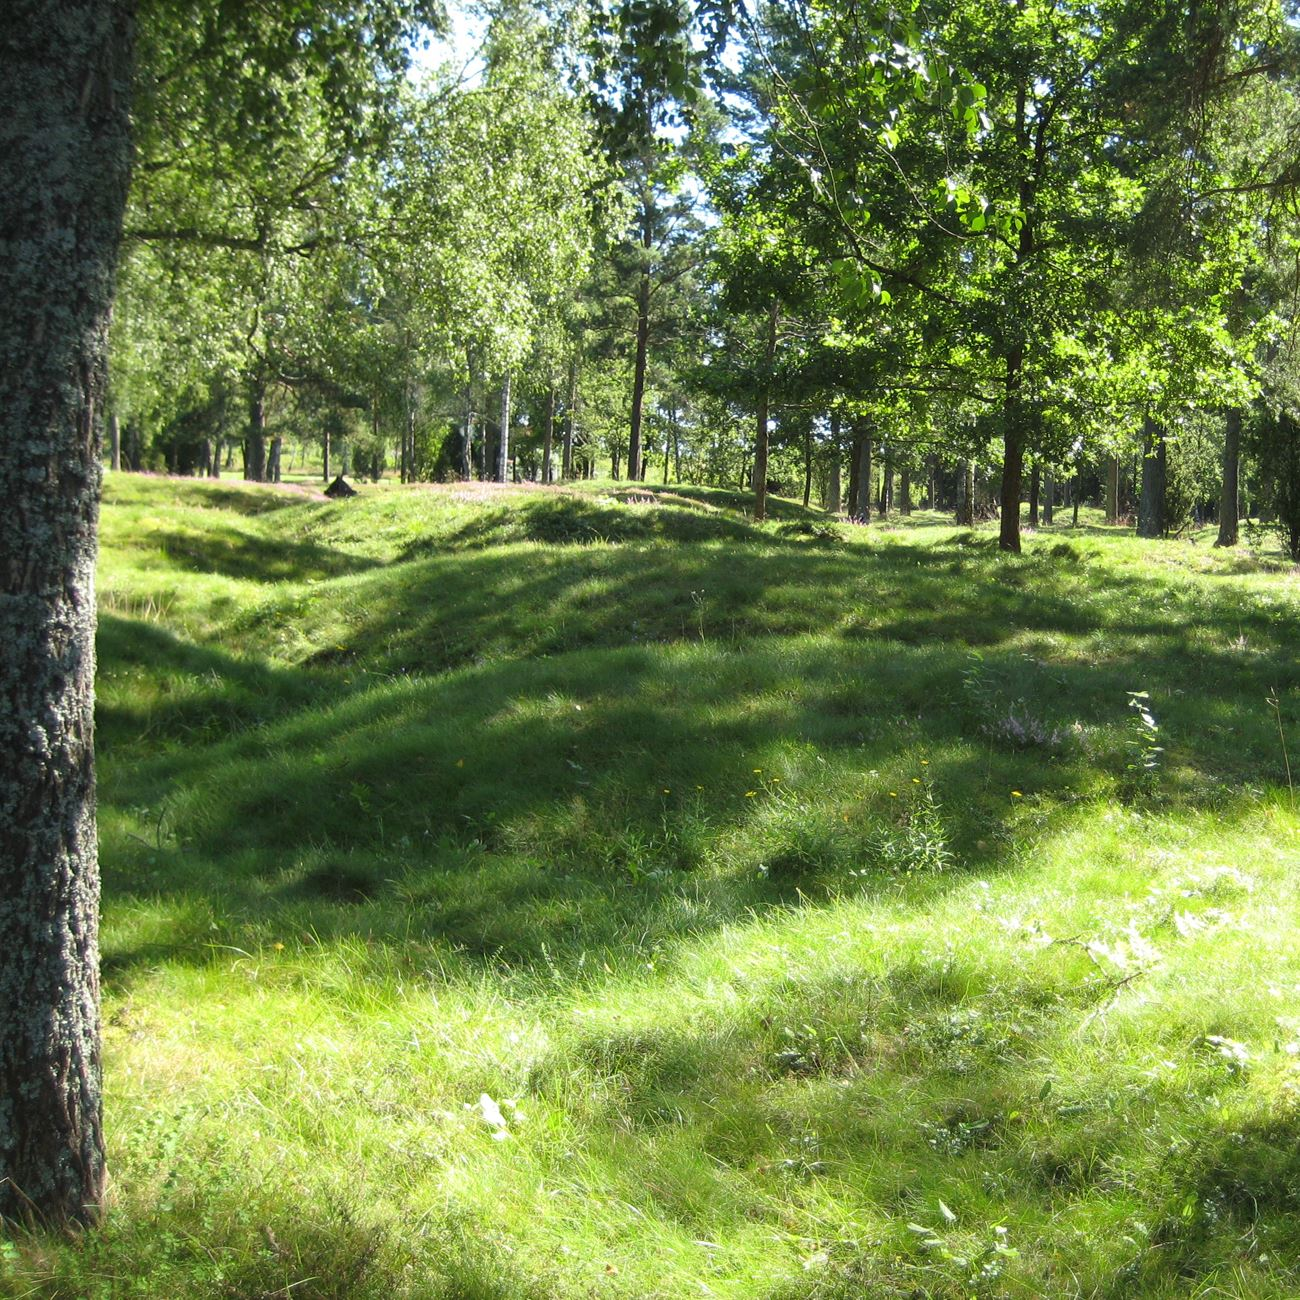 Max Wickman,  © Värnamo Näringsliv AB , Hångers alter Friedhof